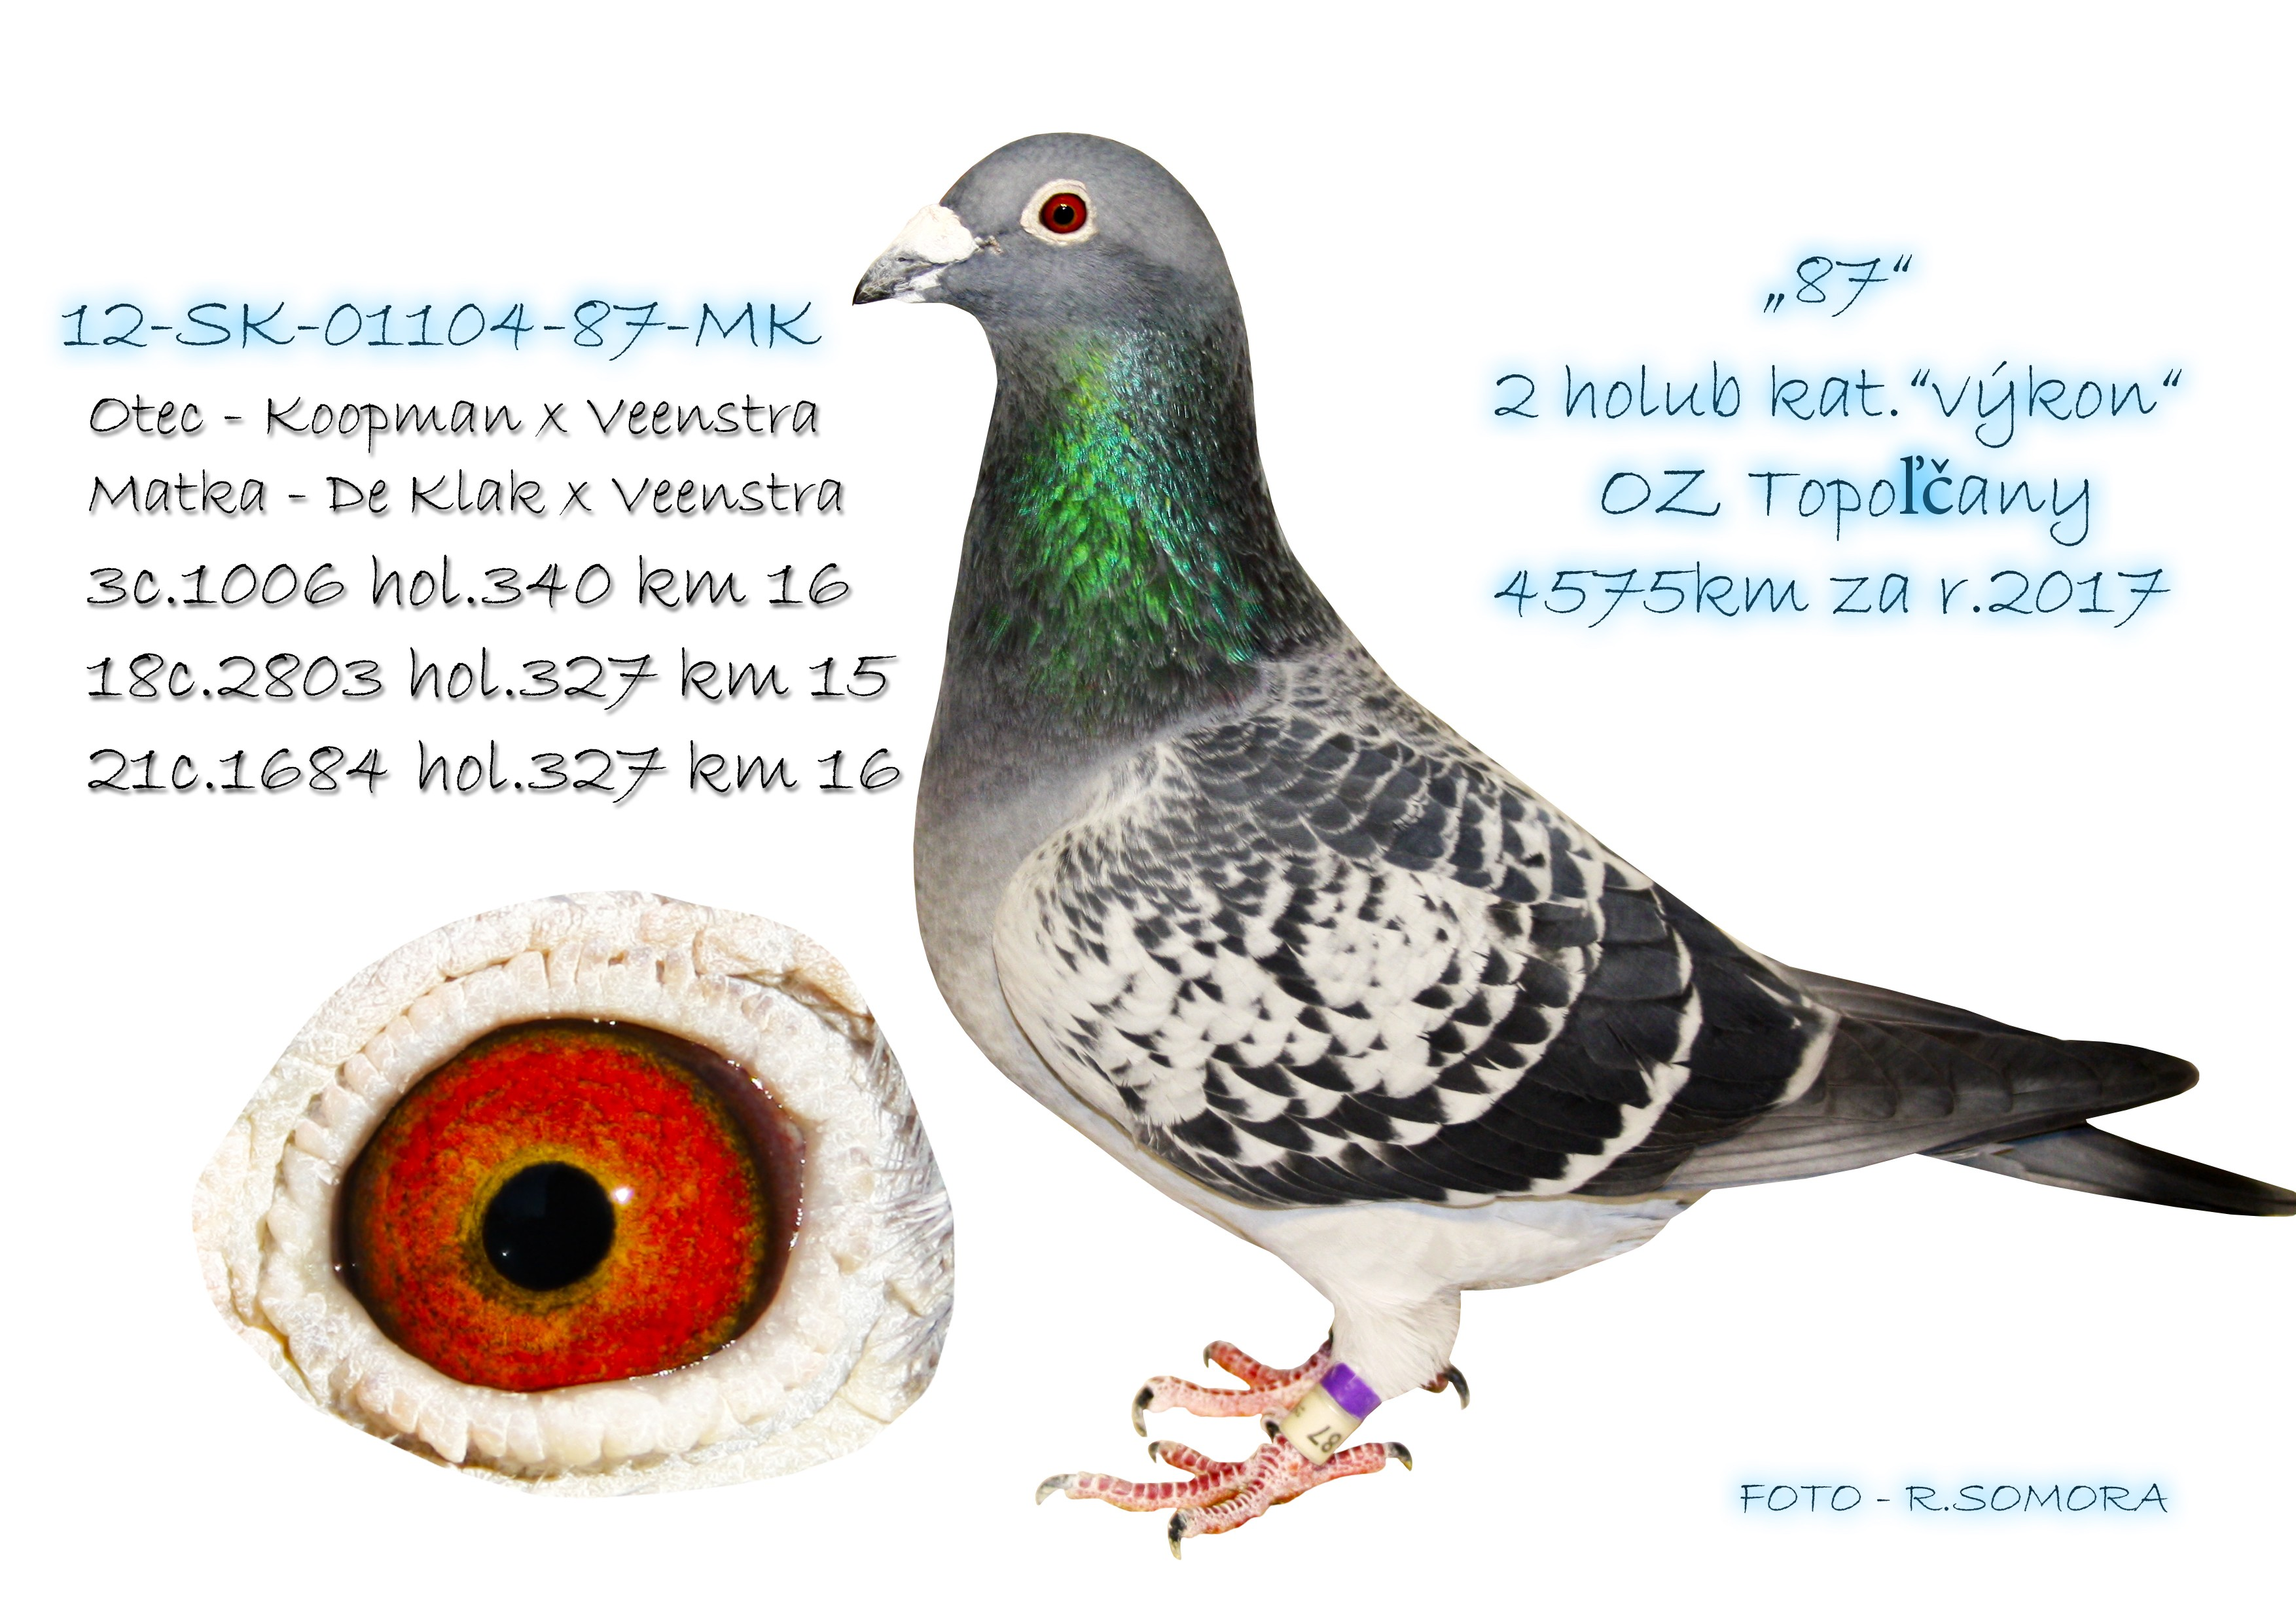 SK-2012-01104-87 - Somora Jozef+Rudolf